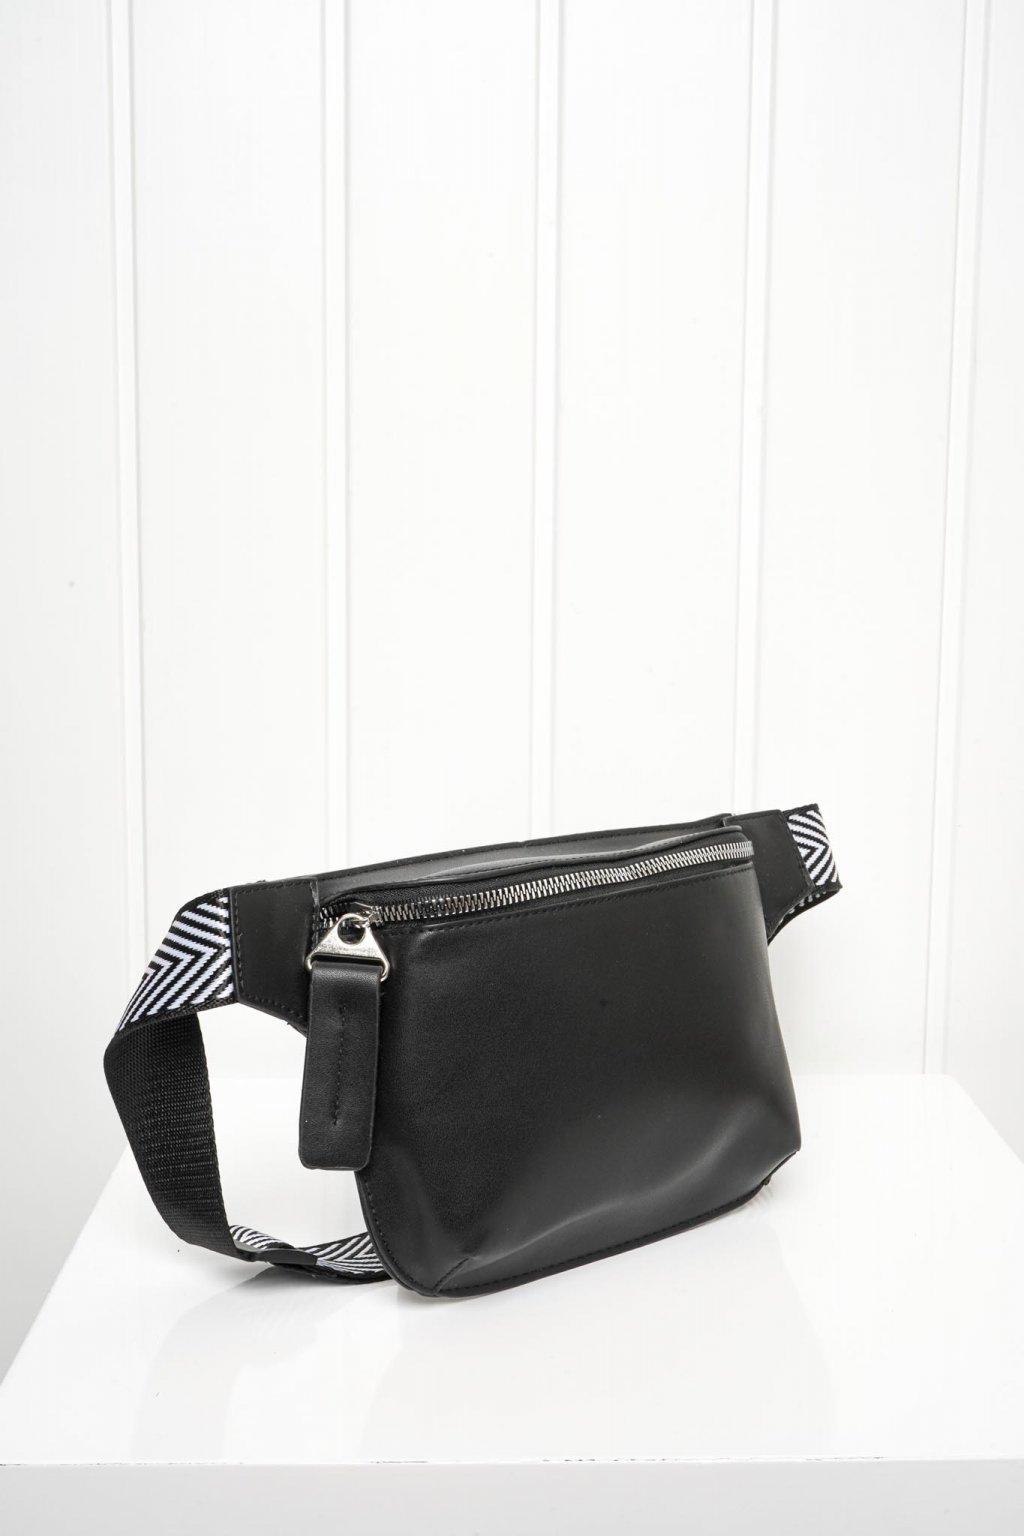 Kabelka, crossbody, ruksak, shopping bag, shopperka, 629